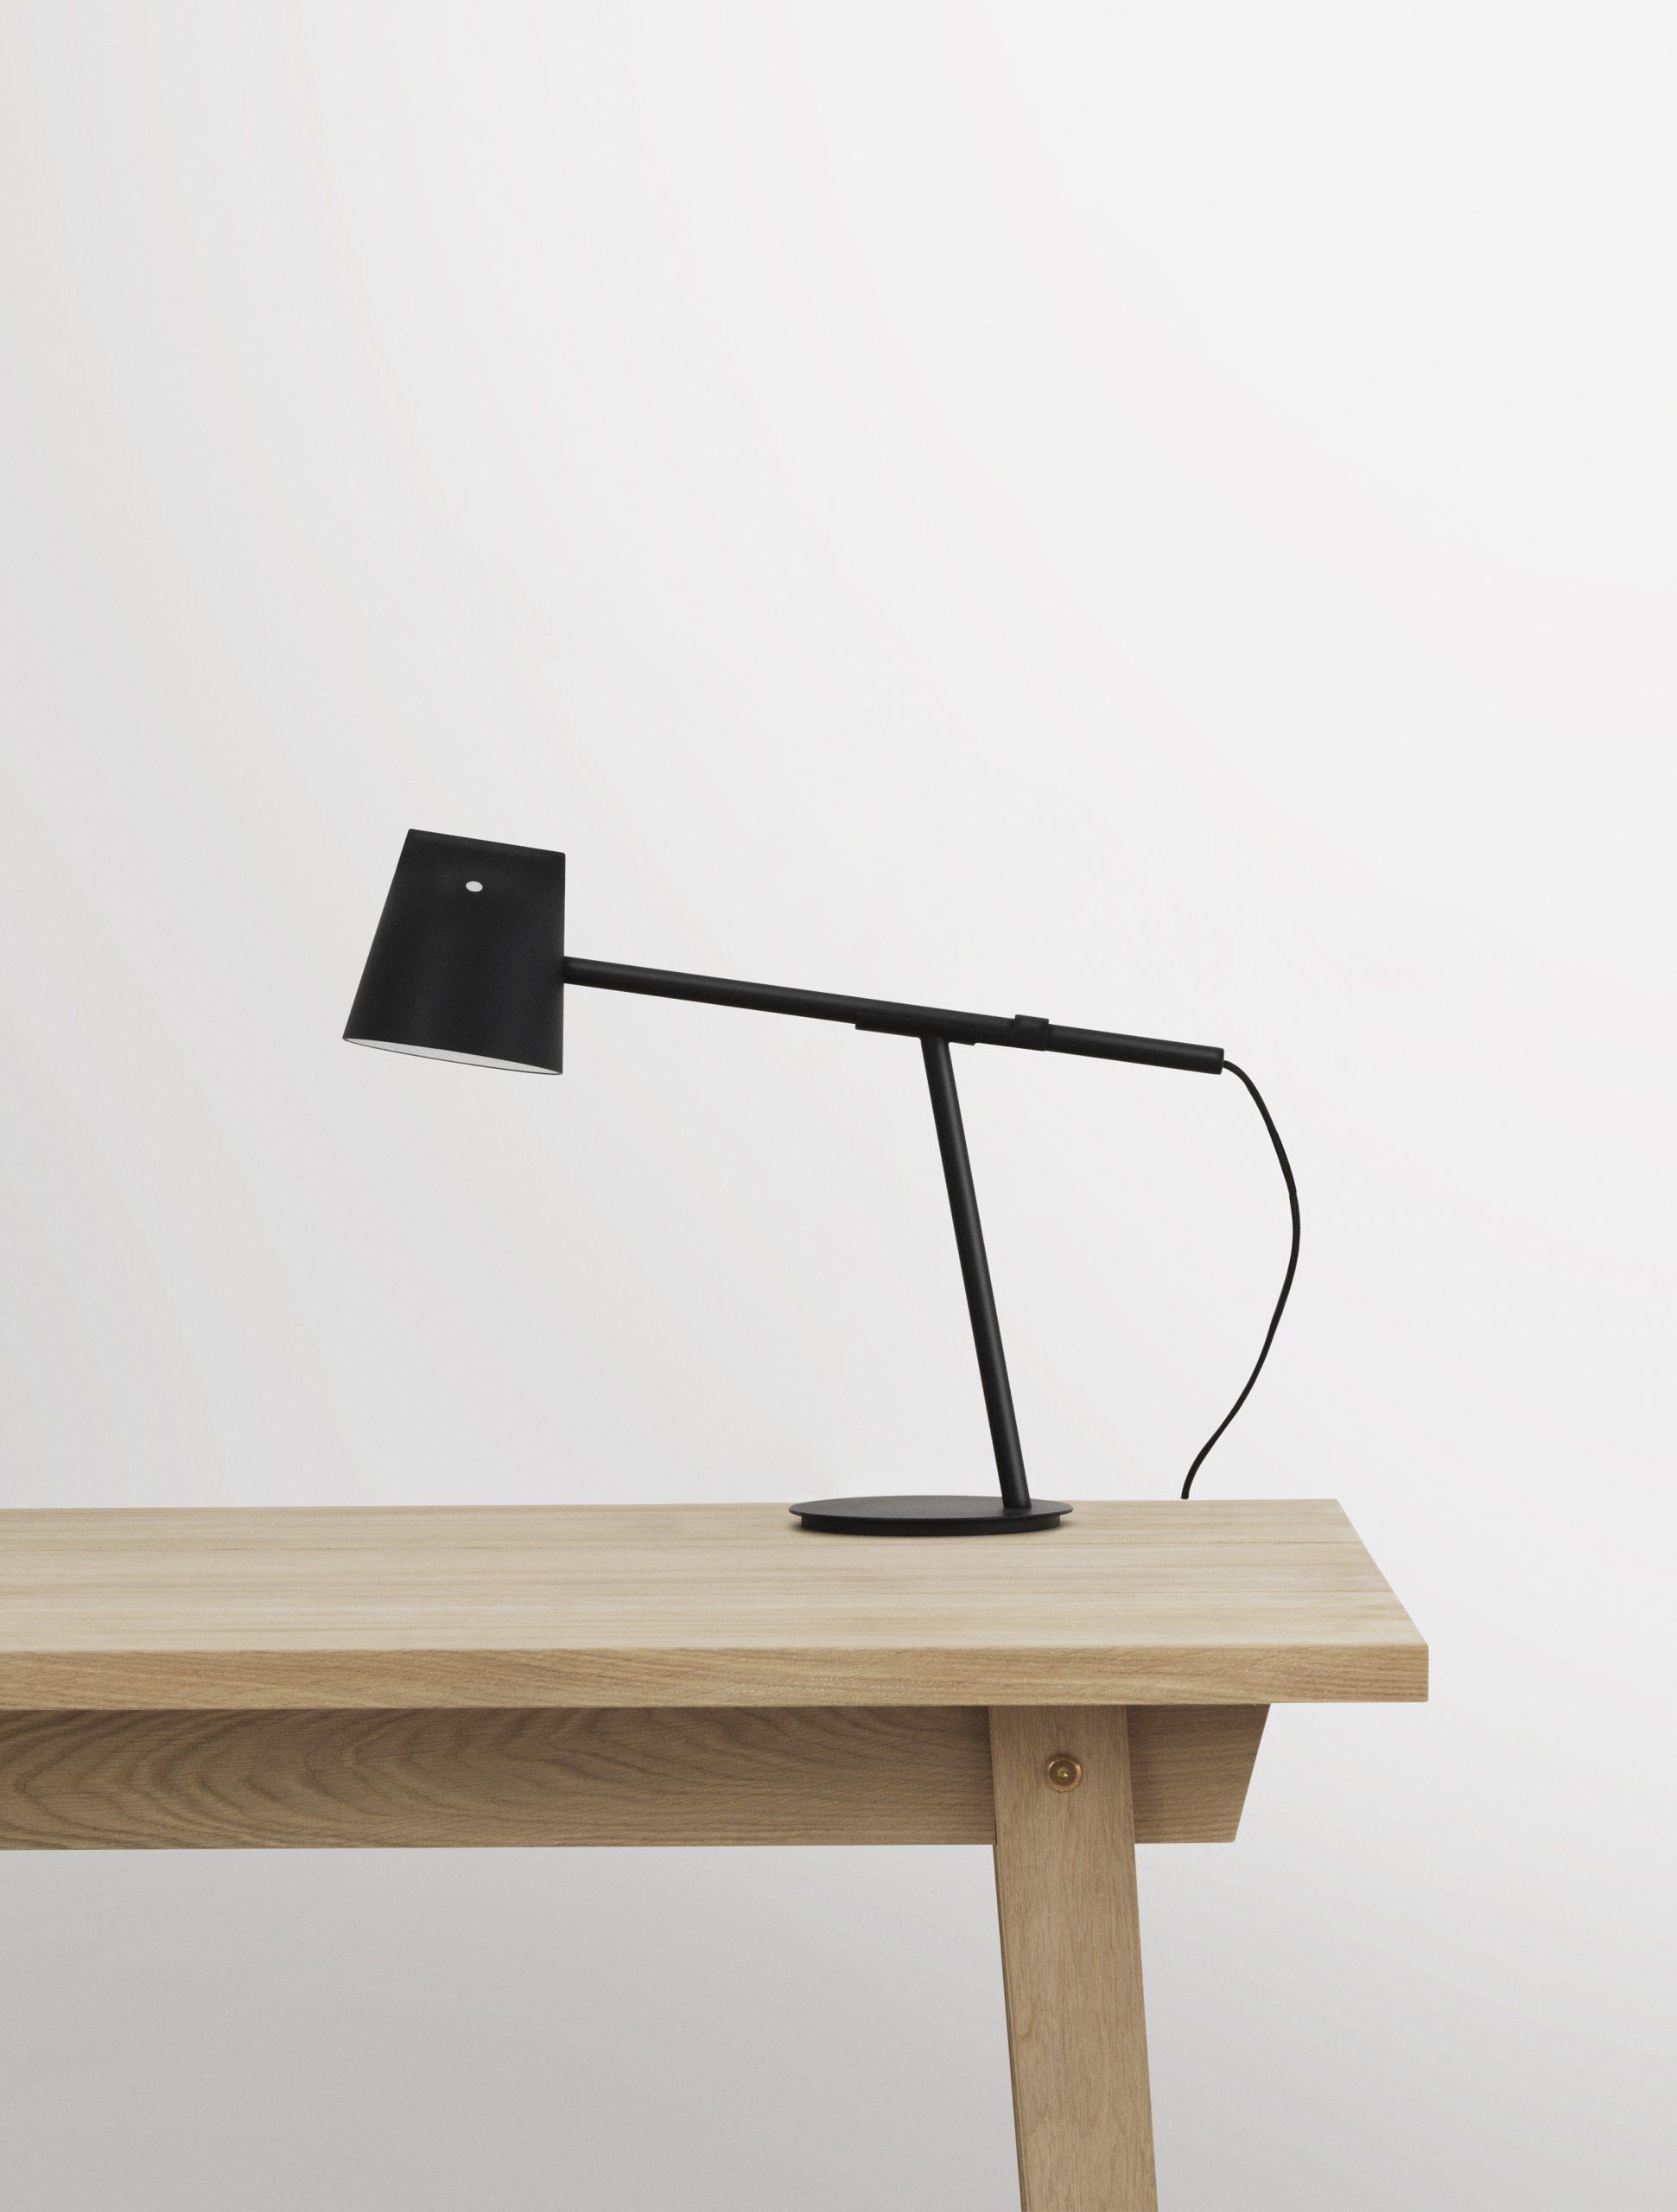 Black Momento lamp by Debiasi Sandri